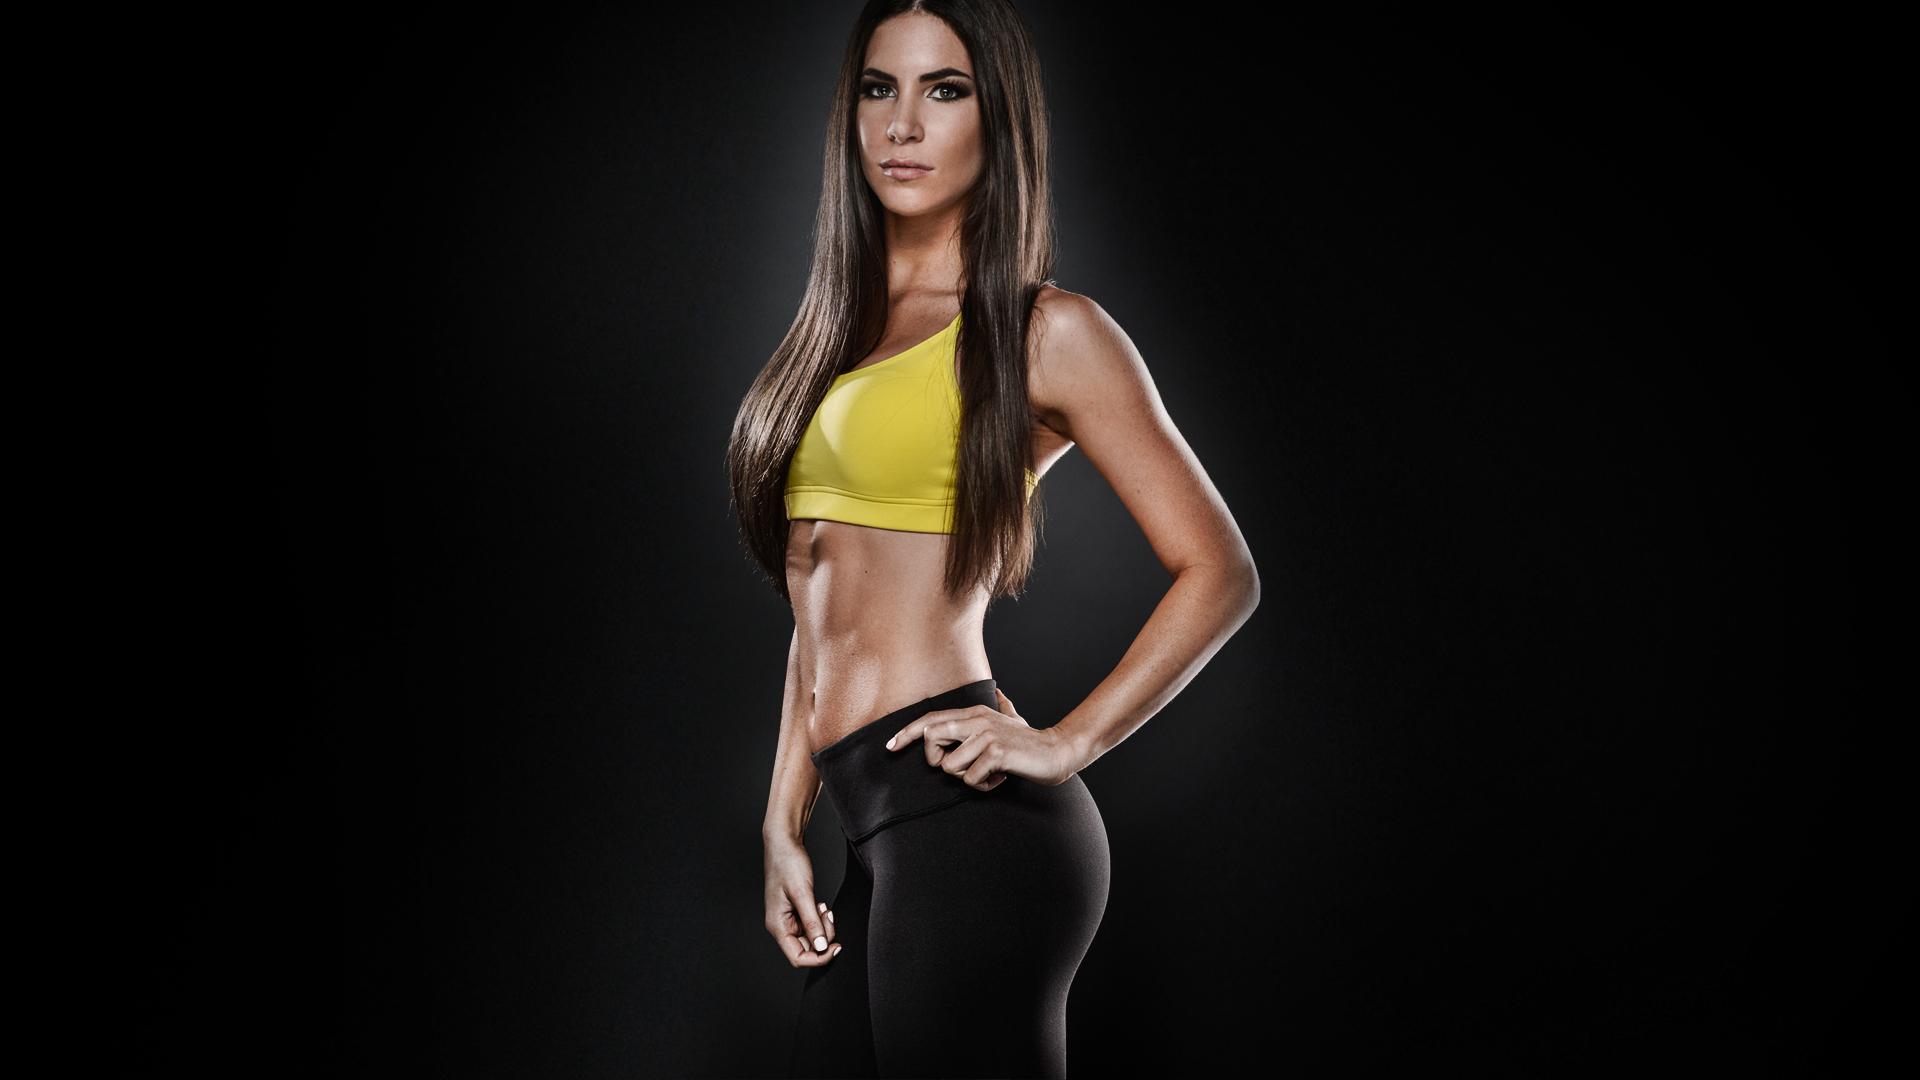 Model big tits image